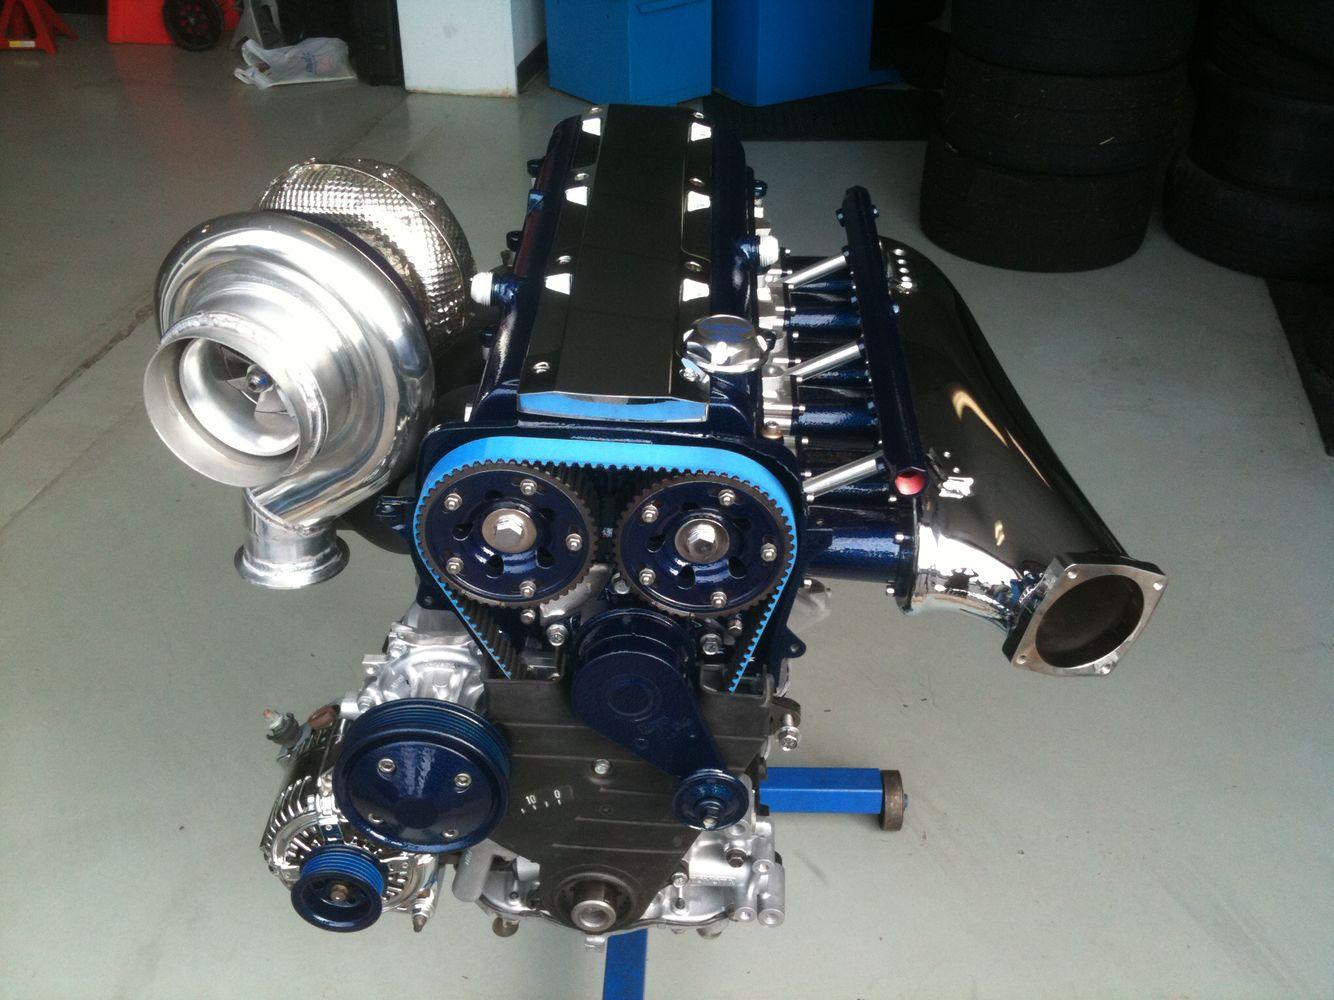 Toyota Supra Turbo 2JZ engine I built  | Automotive | Toyota